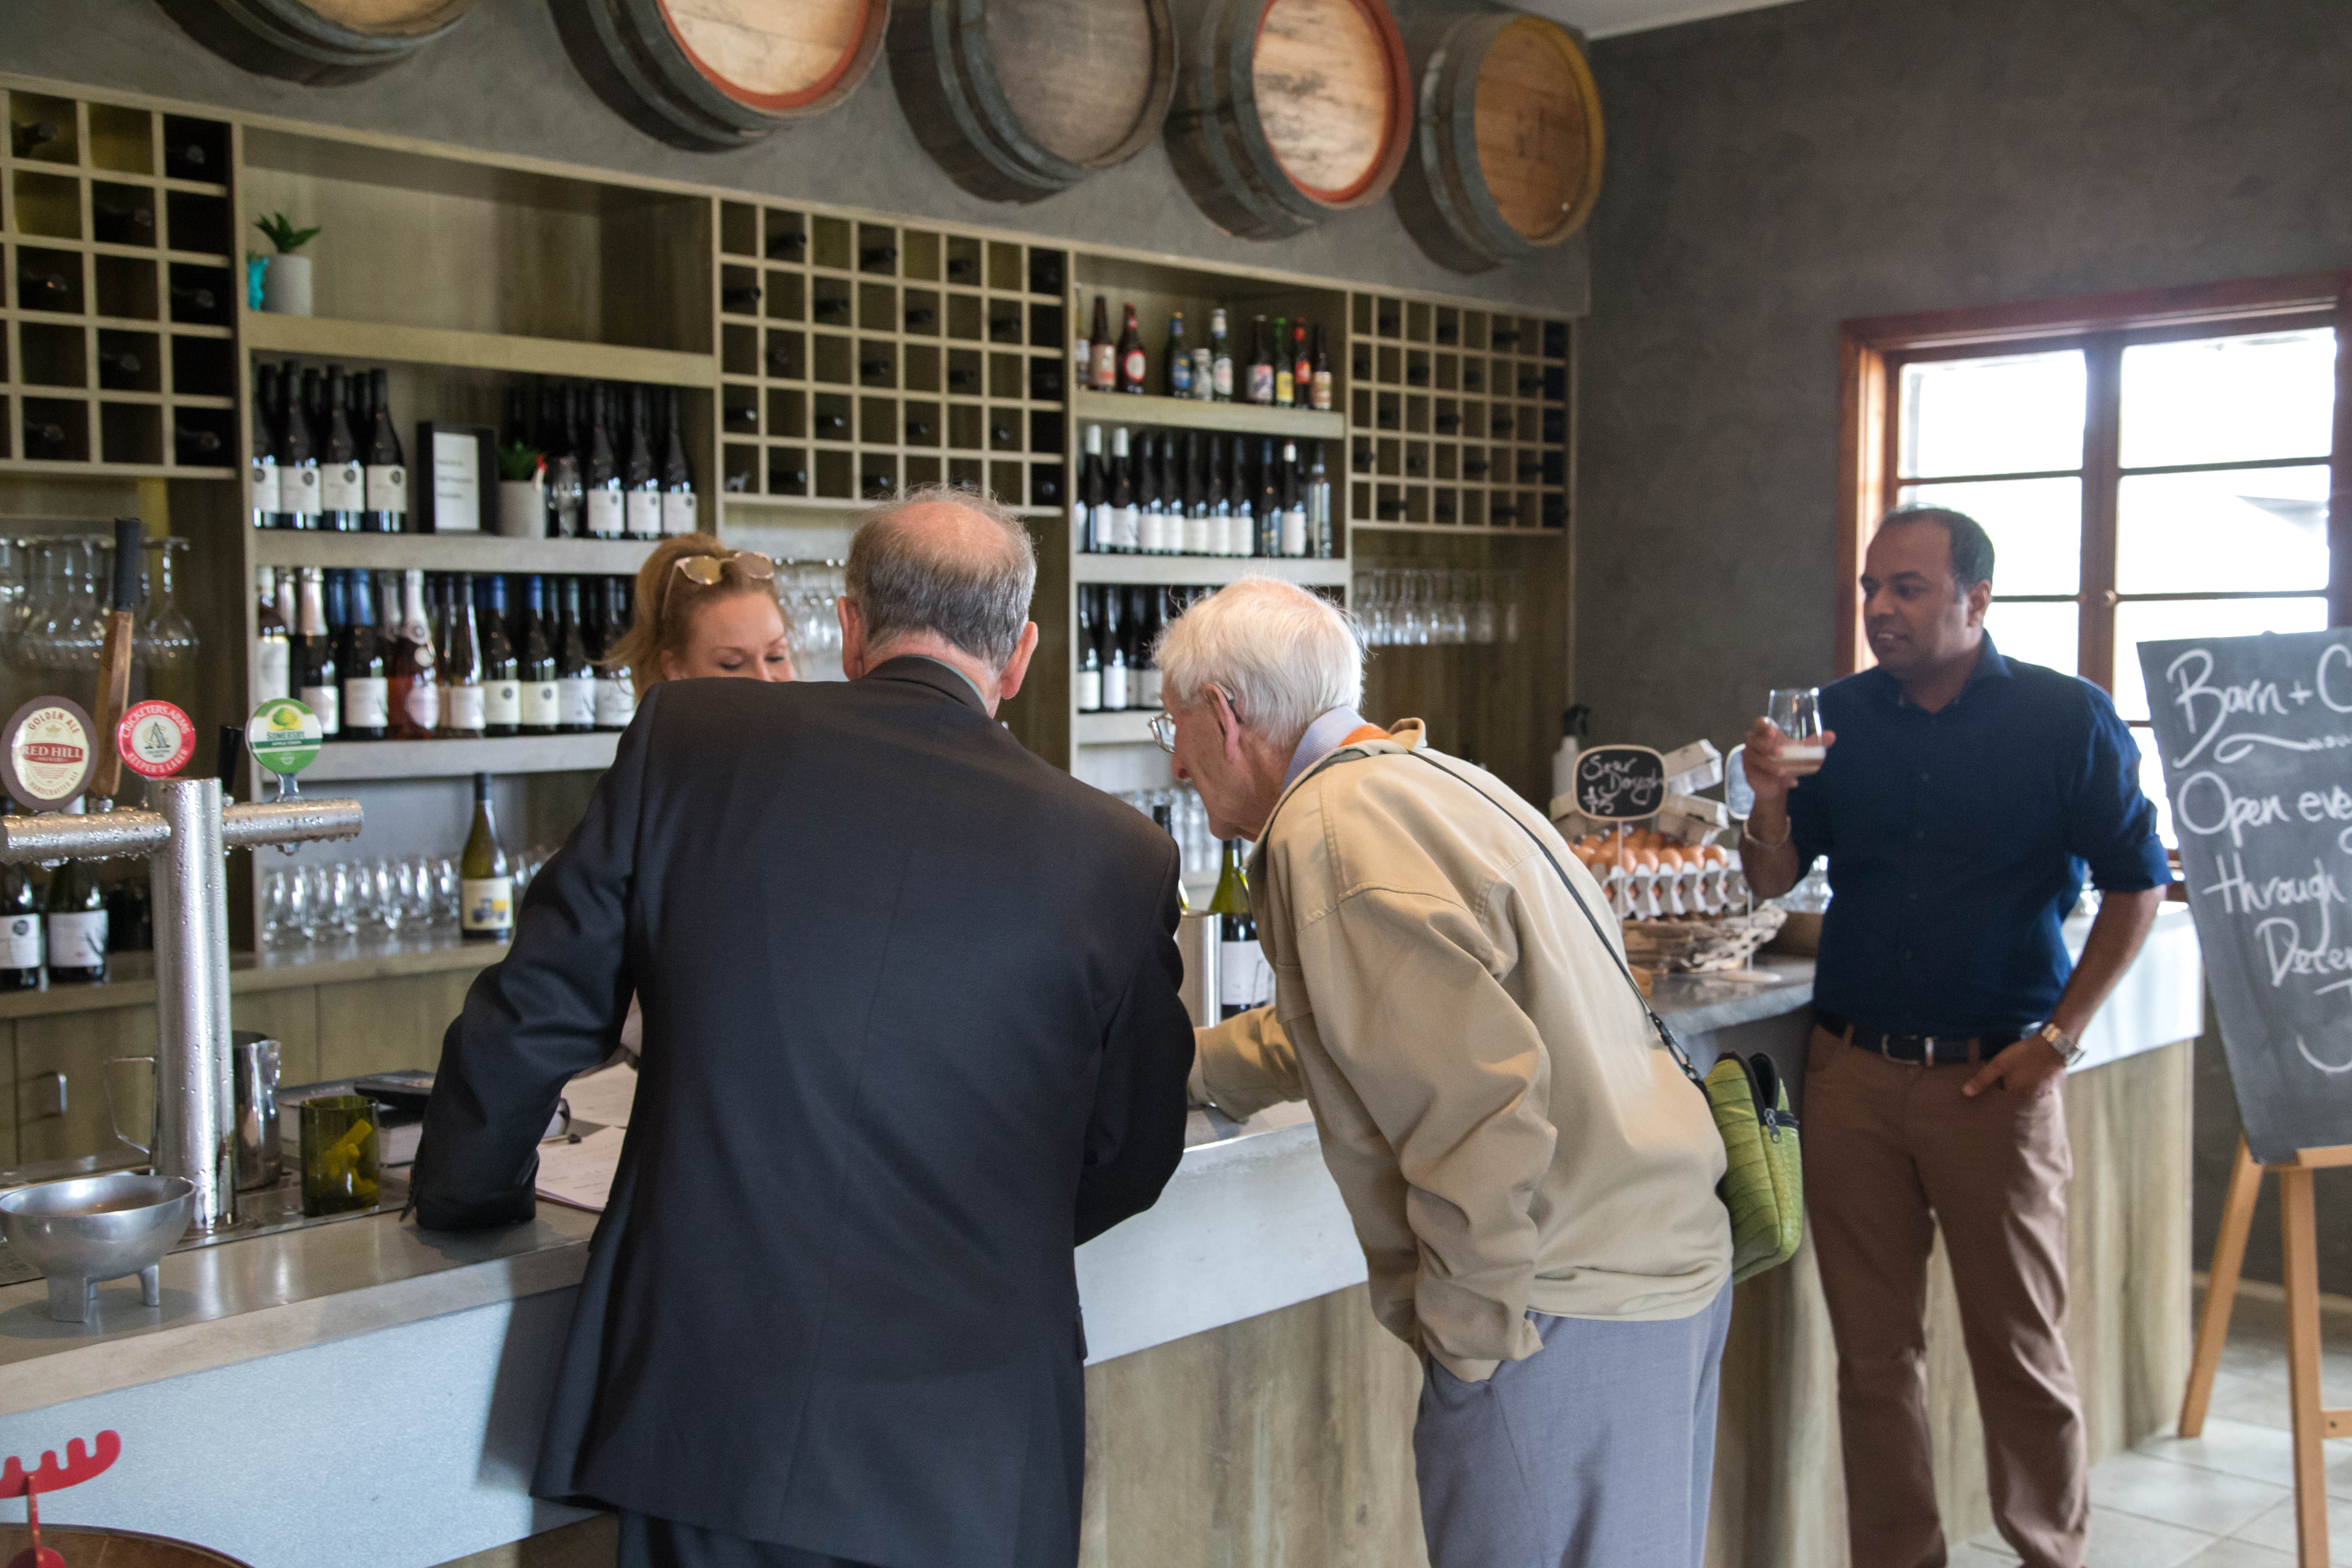 Wine tasting at Barn & Co